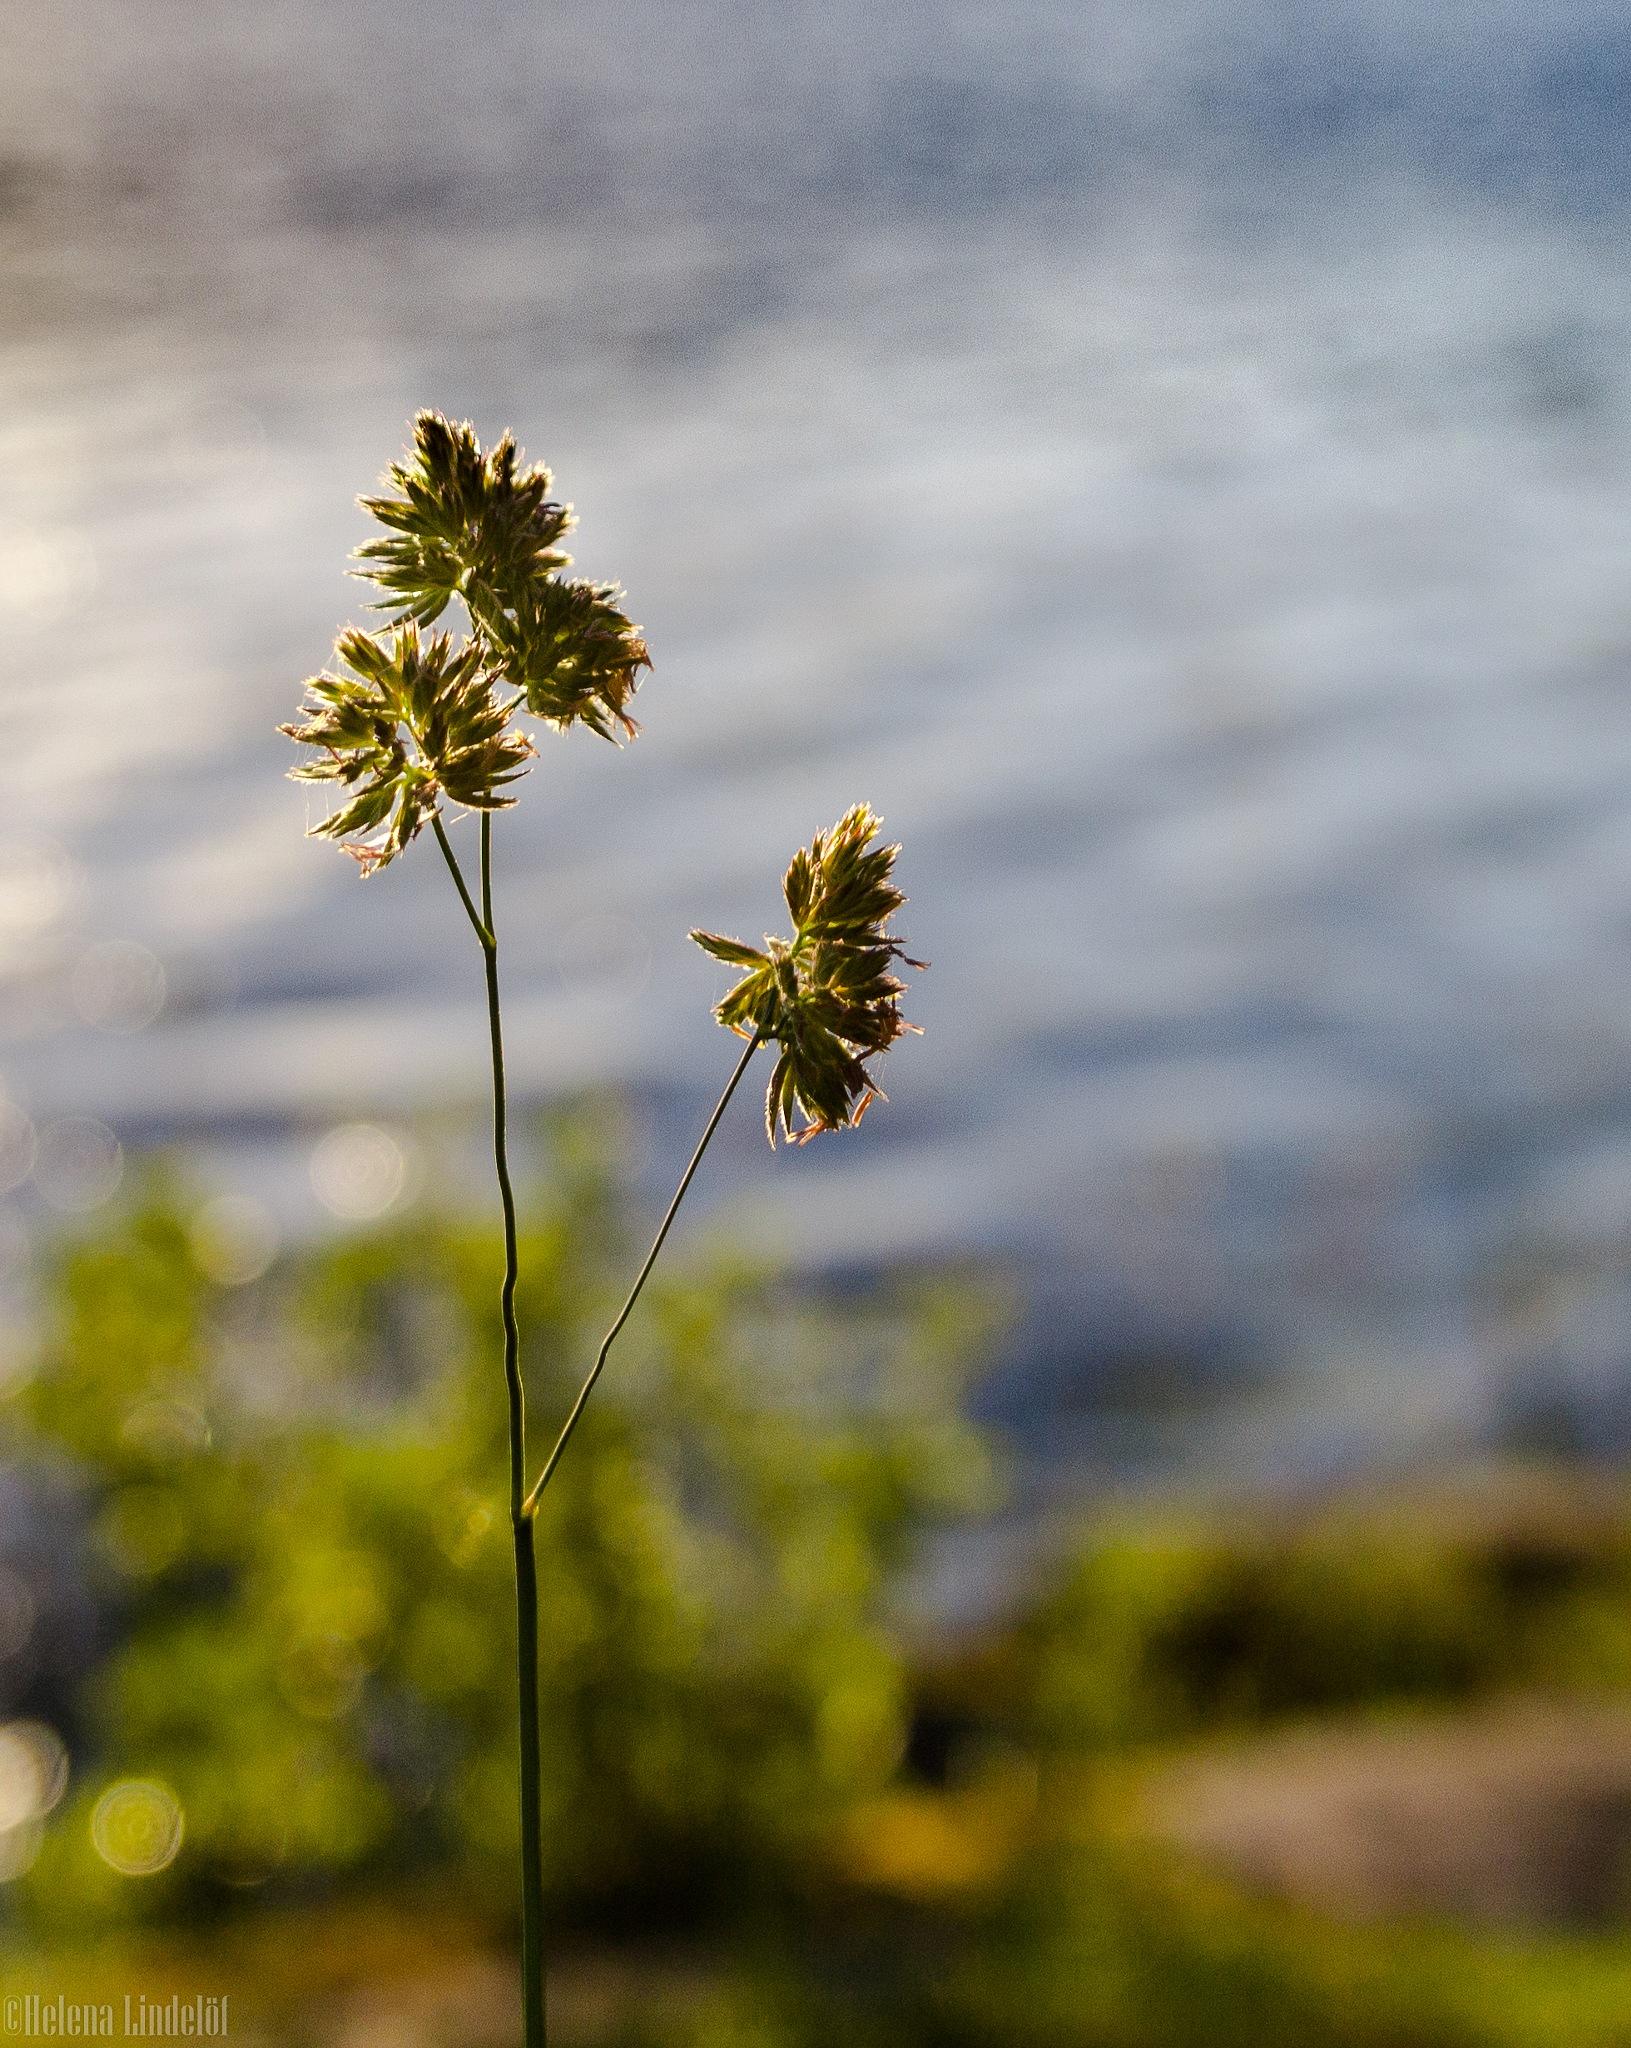 Grass by Helena Lindelöf